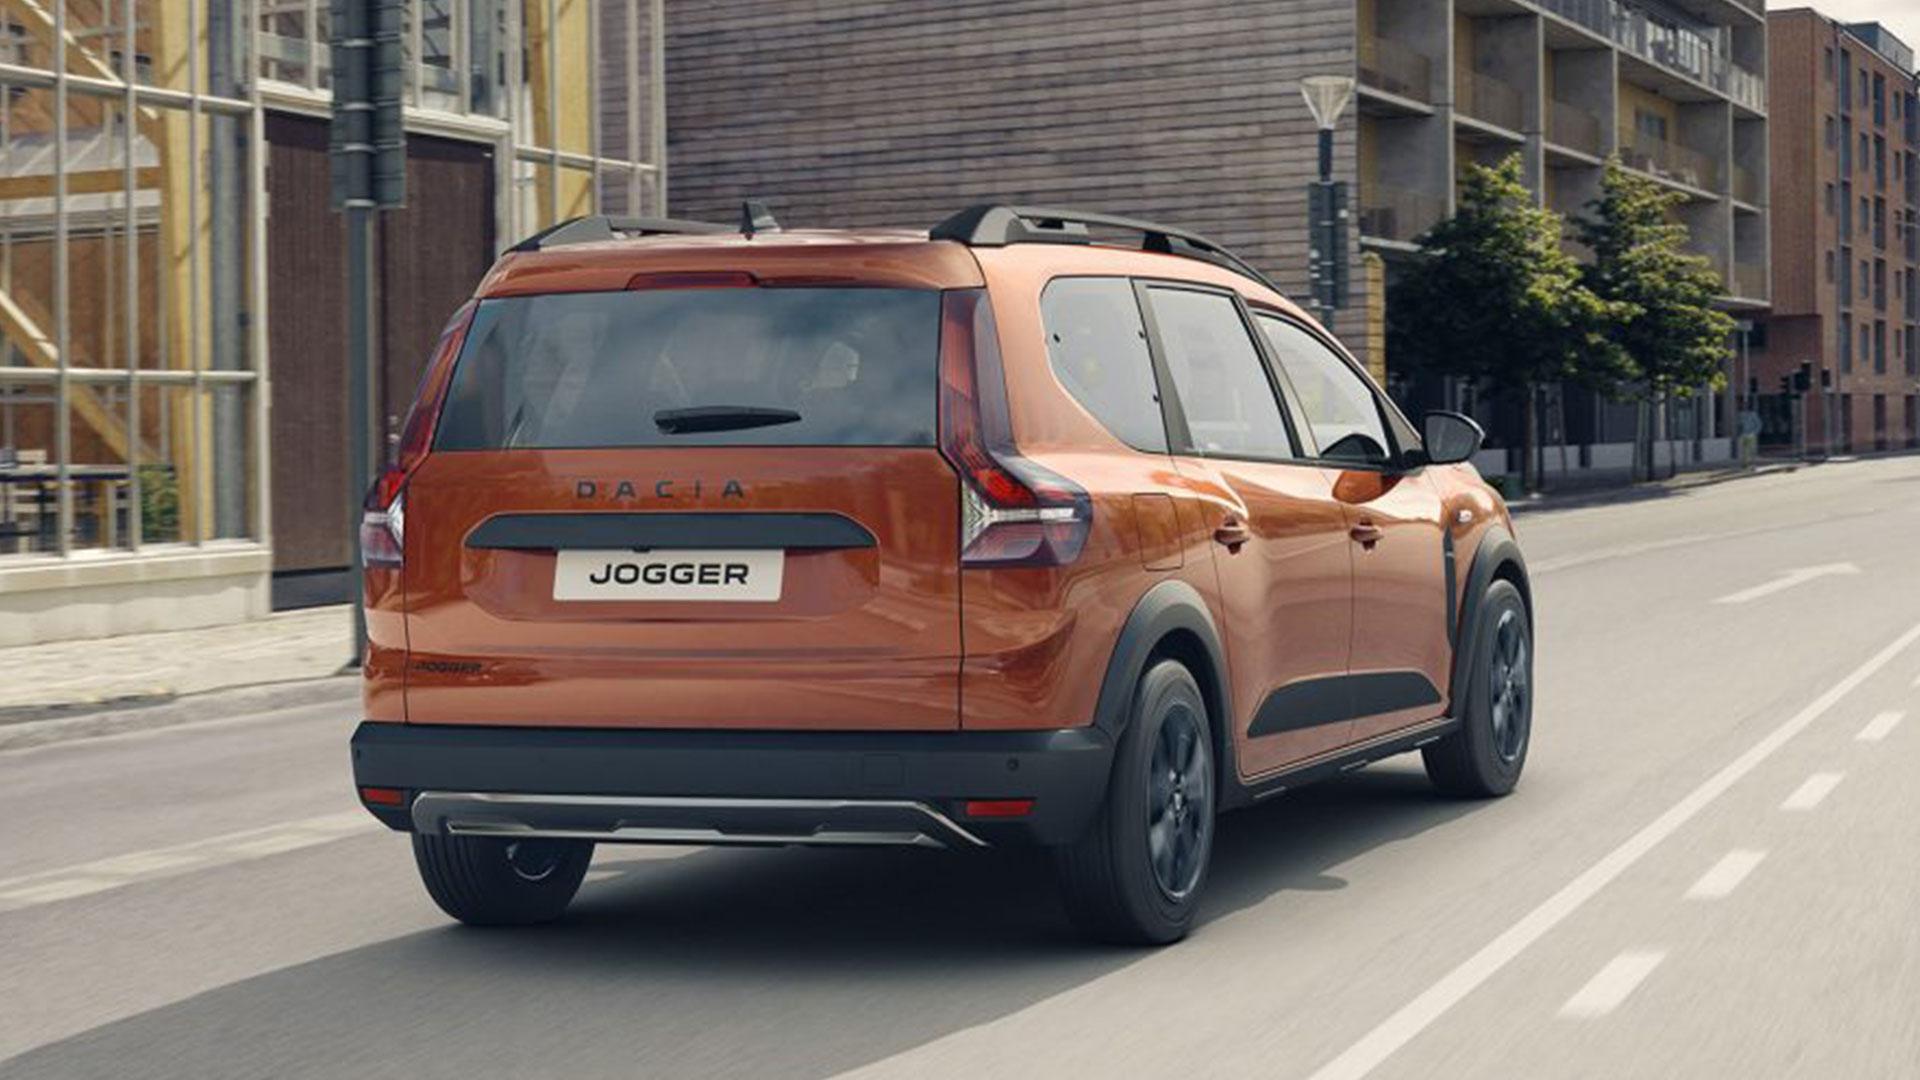 Achterkant Dacia Jogger (2021)